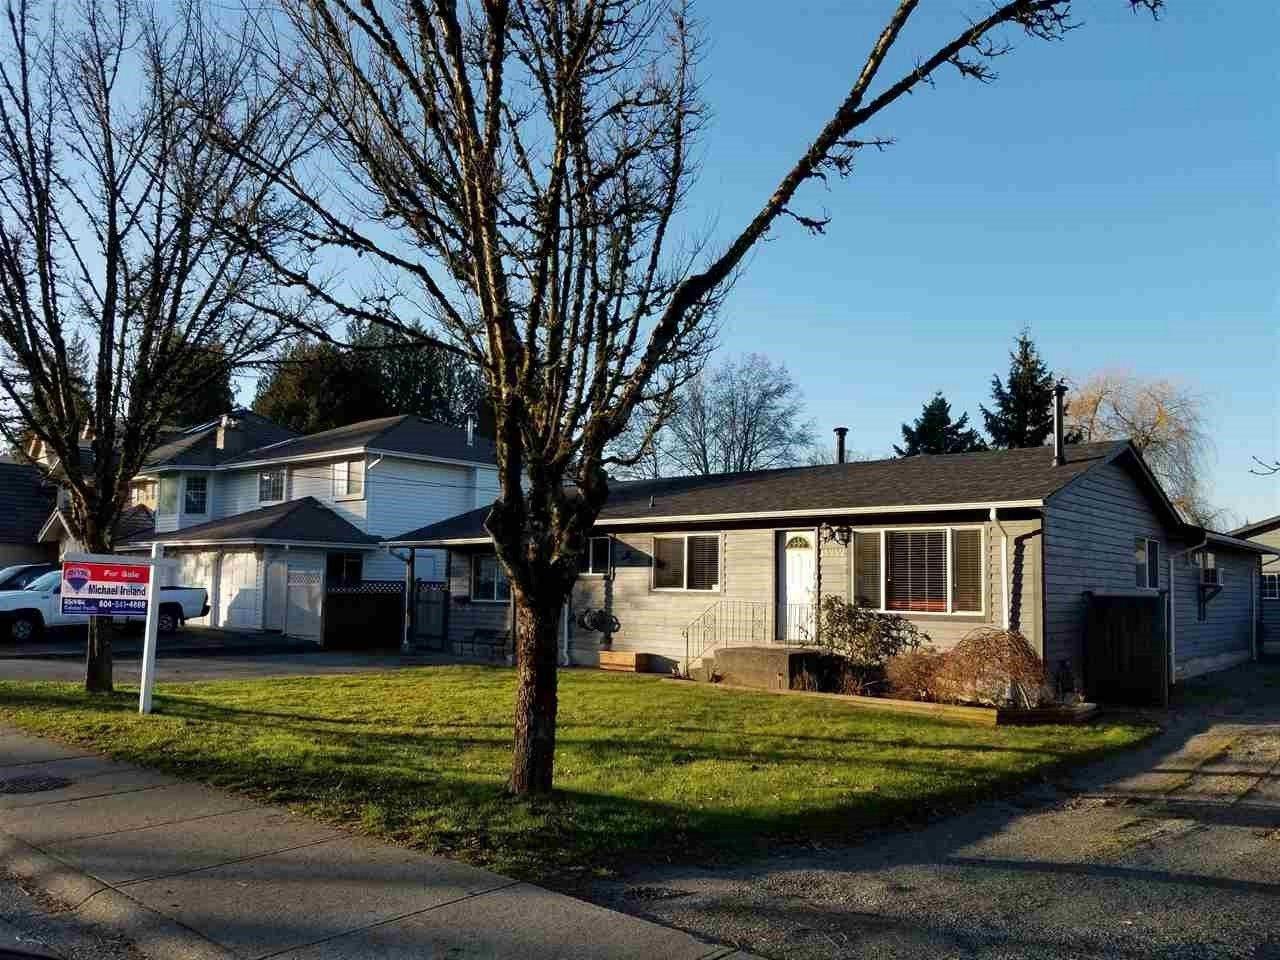 Main Photo: 15757 92 Avenue in Surrey: Fleetwood Tynehead House for sale : MLS®# R2233335